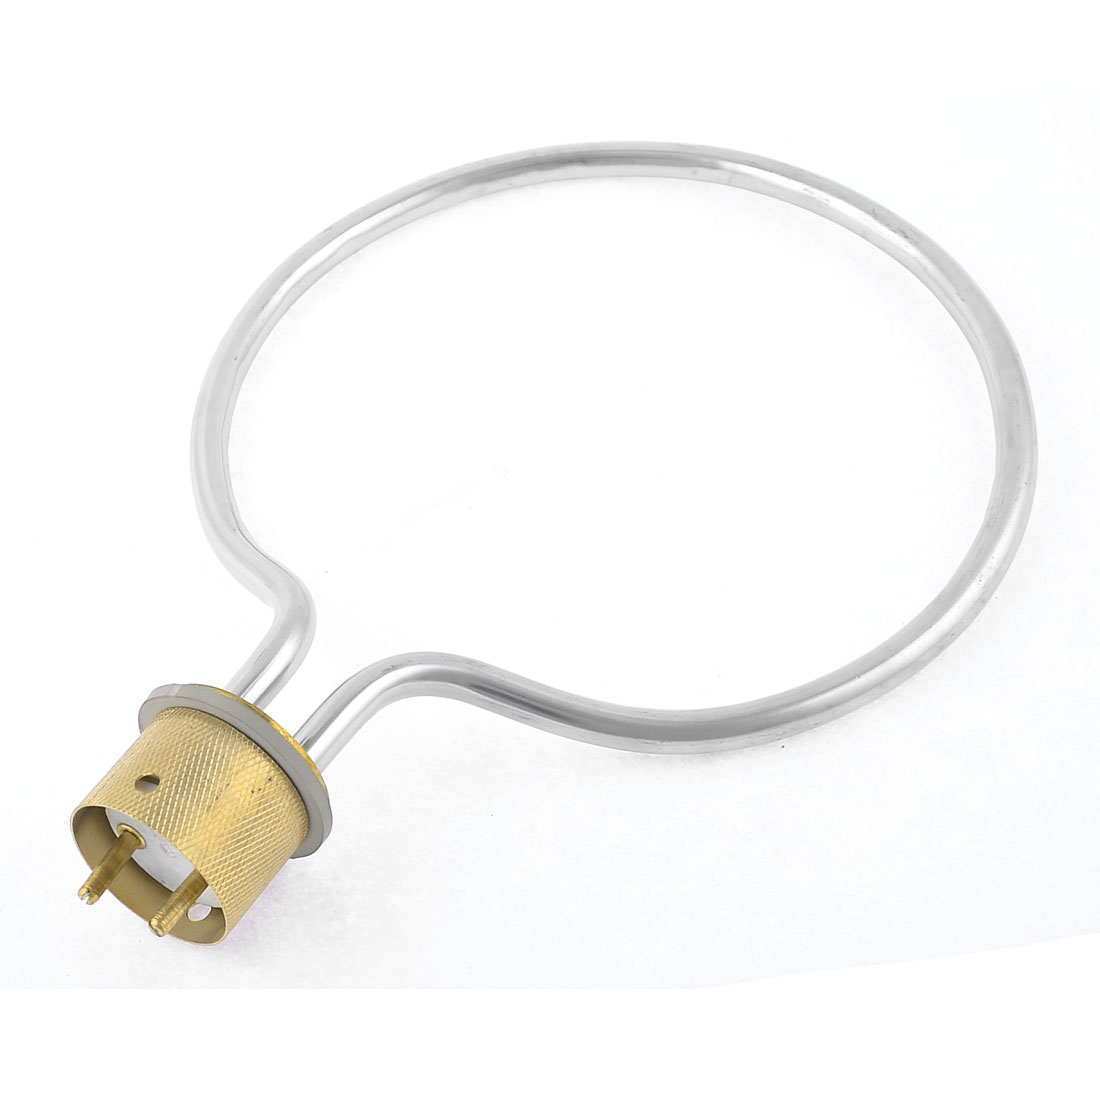 Electric Tubular Water Heater Element 21cm Dia 1000W 220V 2 Round Terminals Plug